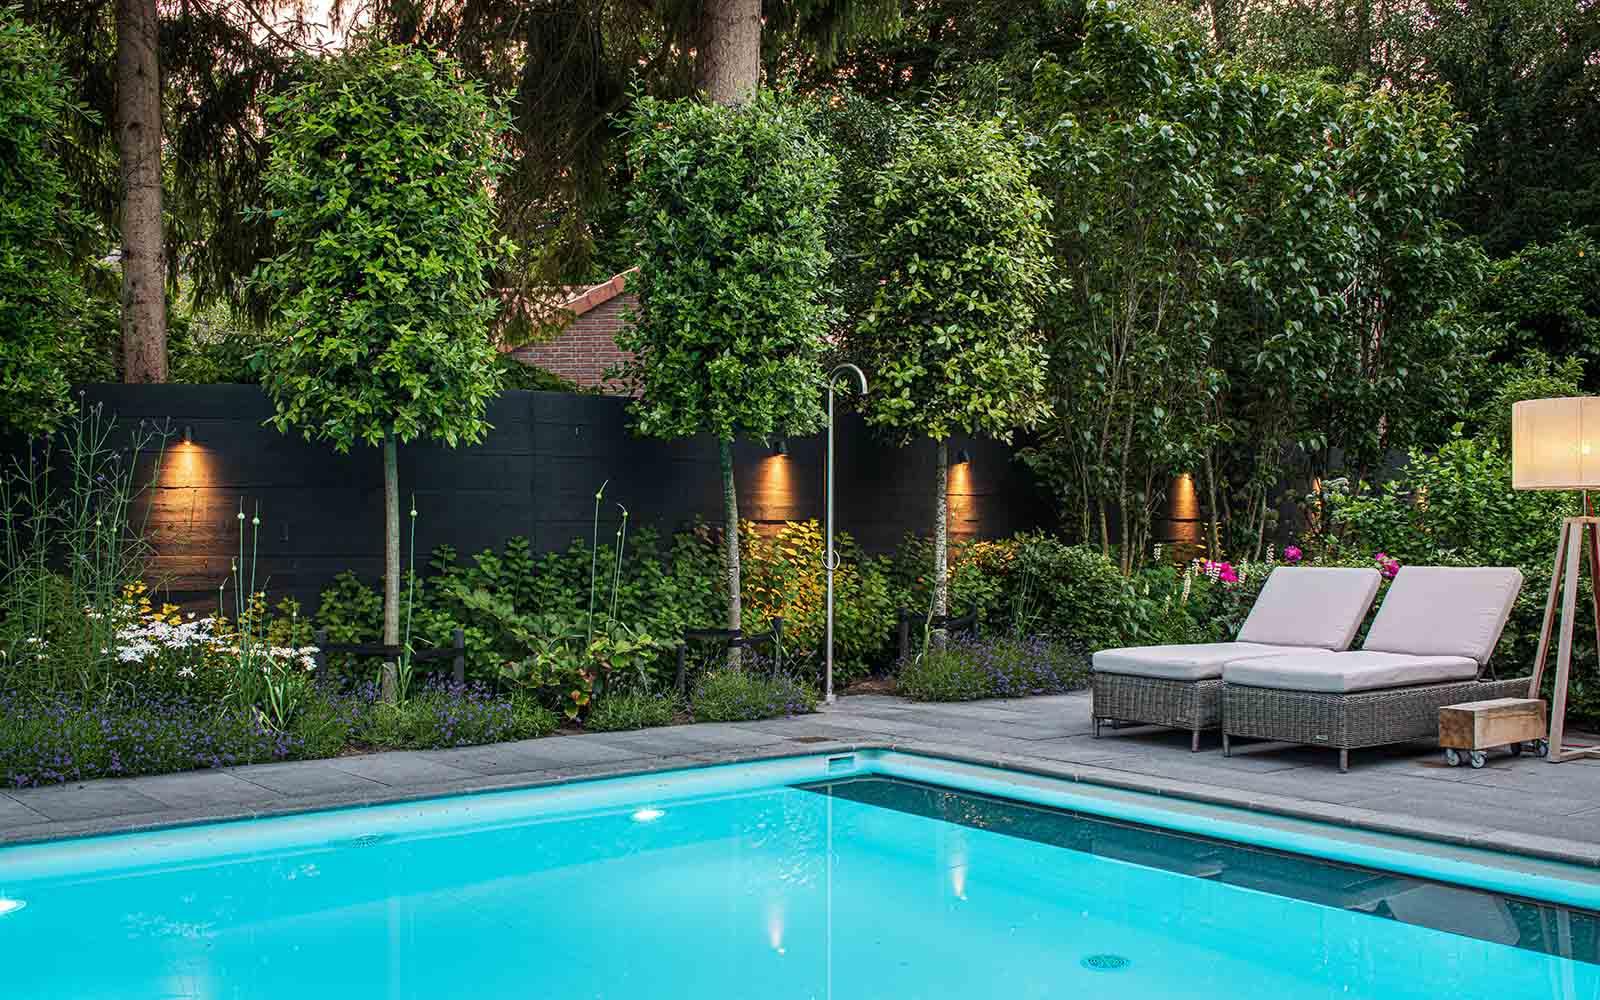 zwembad, martin veltkamp tuinen, martin veltkamp, the art of living